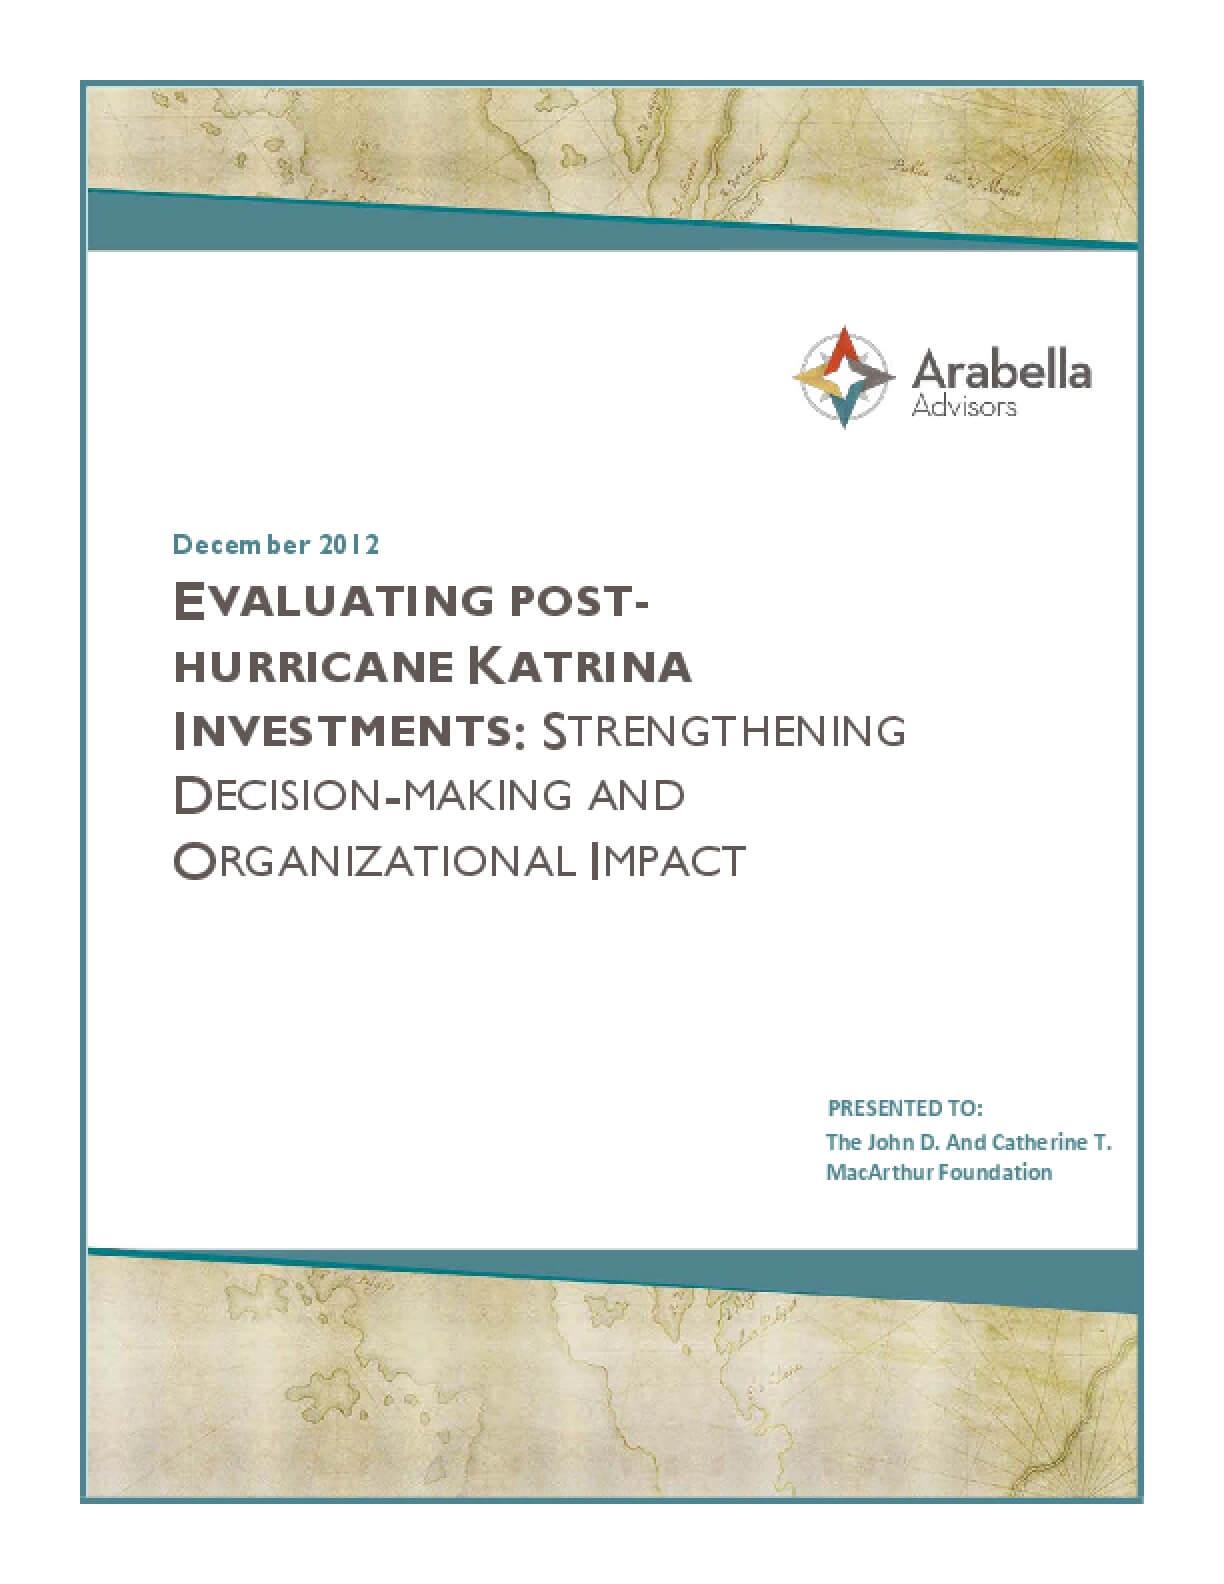 Evaluating Post-Hurricane Katrina Investments: Strengthening Decision-Making and Organizational Impact